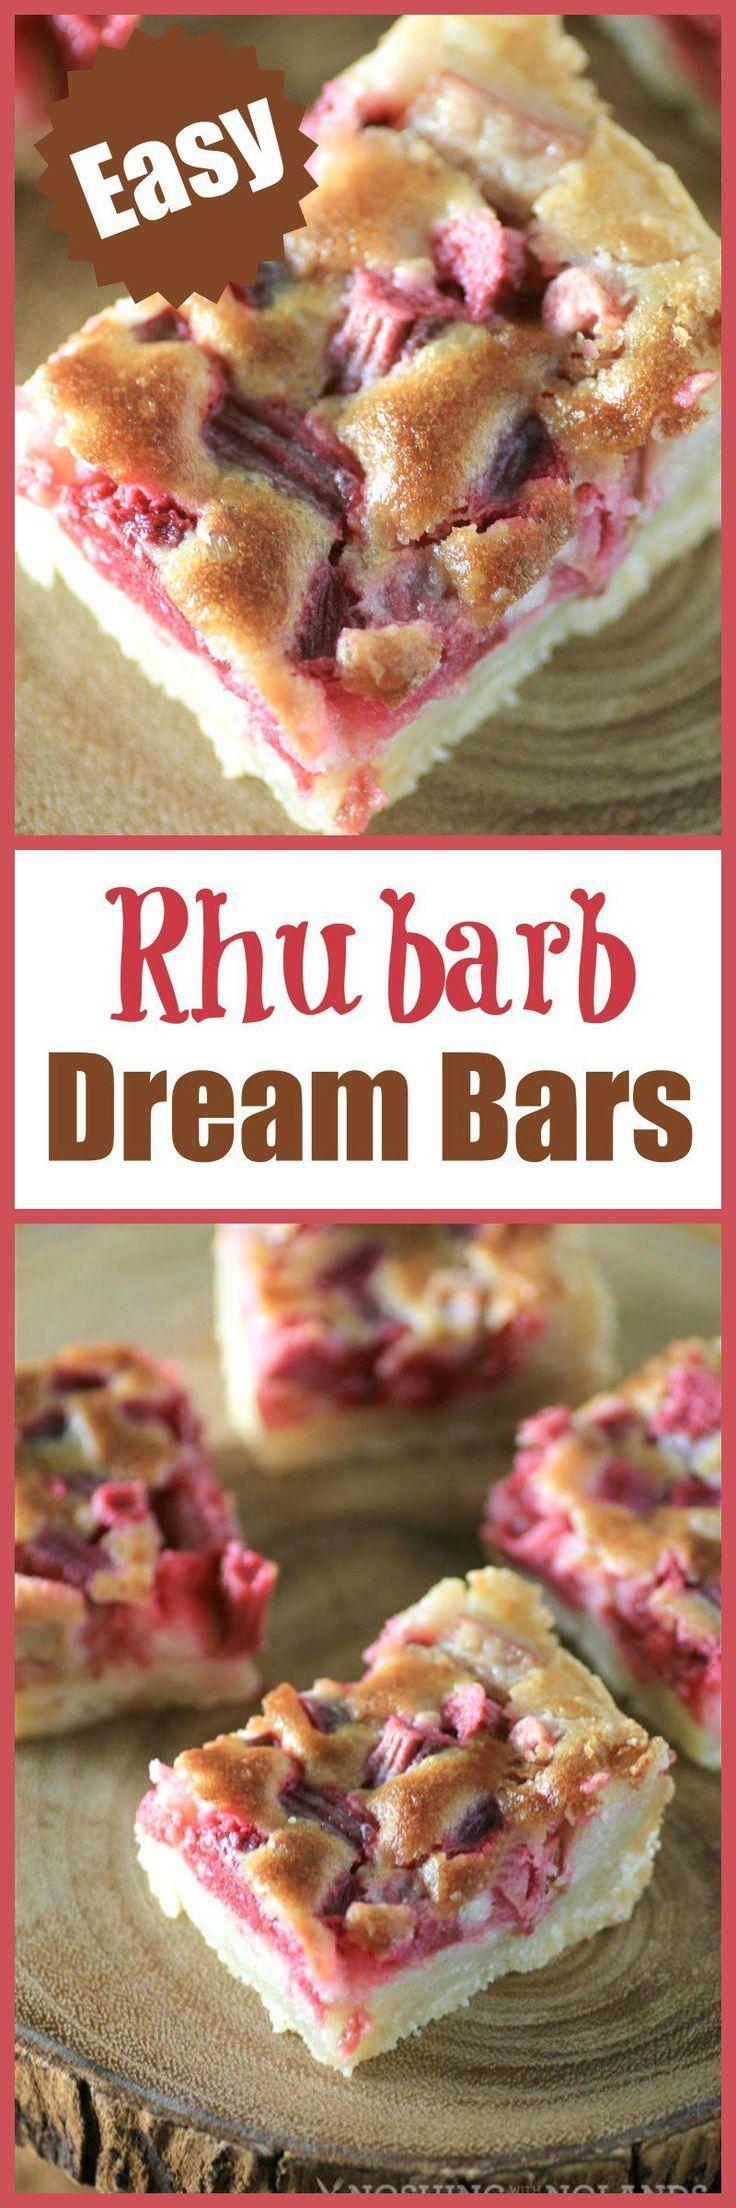 Rhubarb Dream Bars - A creamy rhubarb custard nestled into a flaky butter crust. The perfect spring dessert recipe.